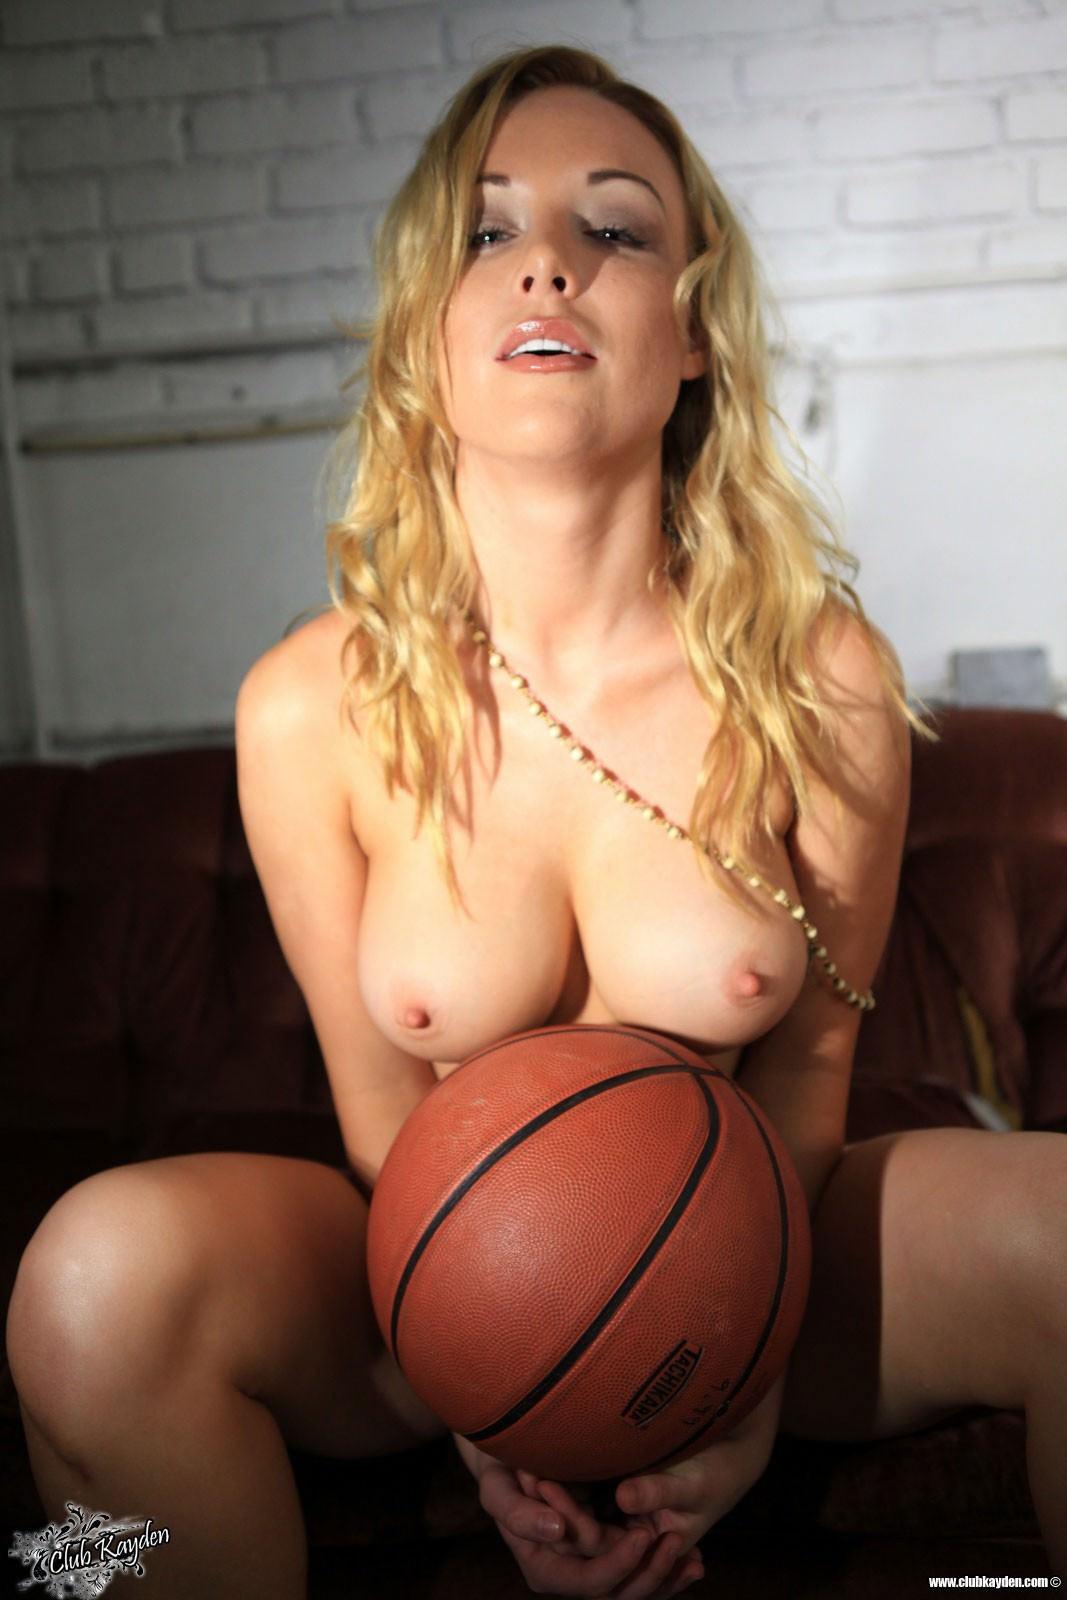 redtube tits